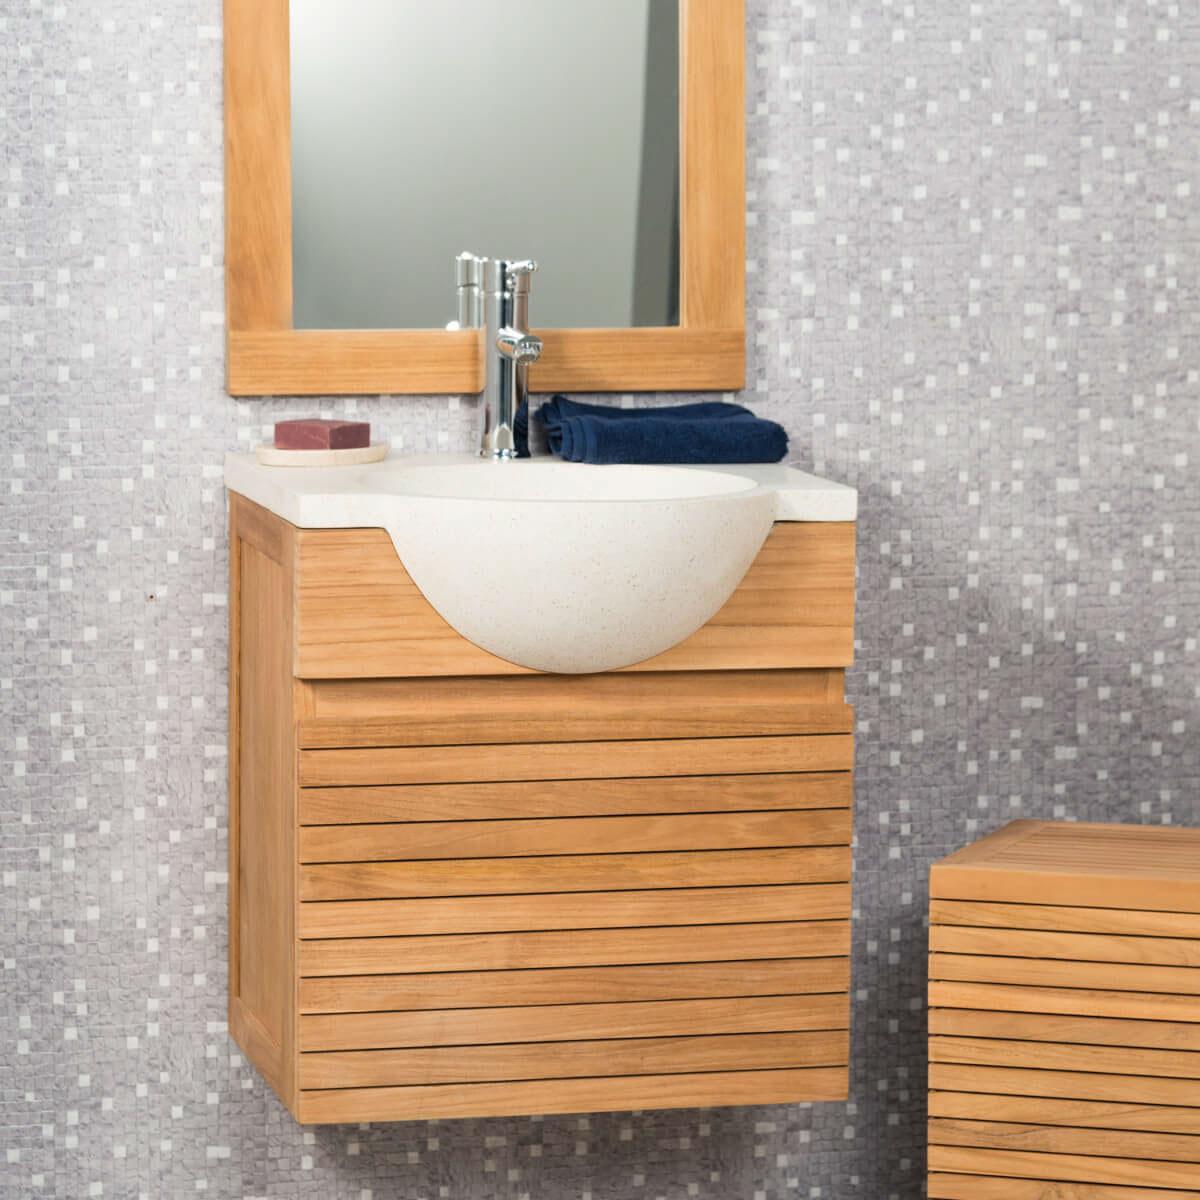 Vasque Salle De Bain A Suspendre meuble salle de bain suspendu avec vasque teck 50 contemporain crème